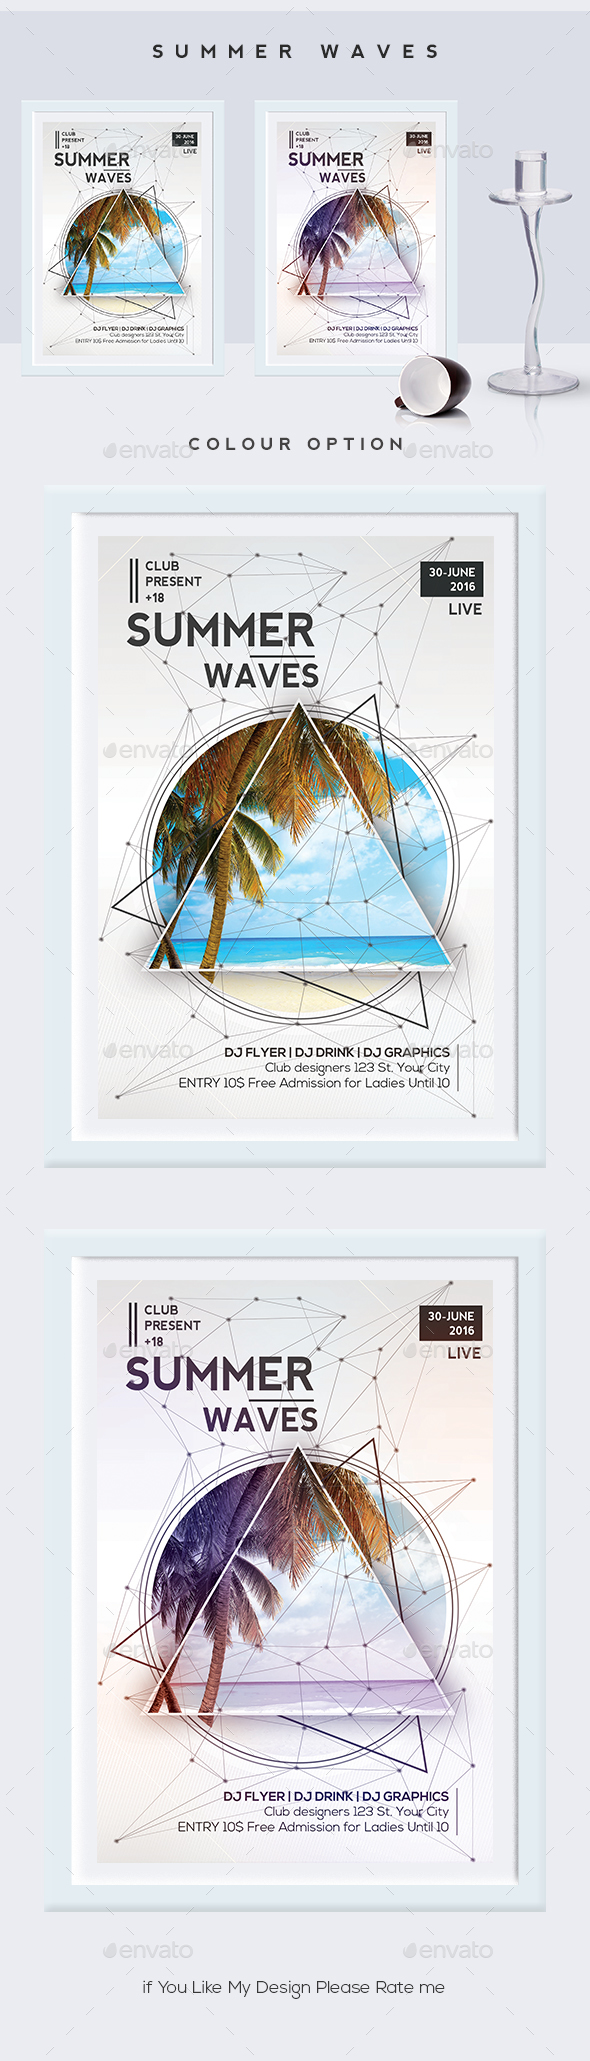 Summer Waves Flyer